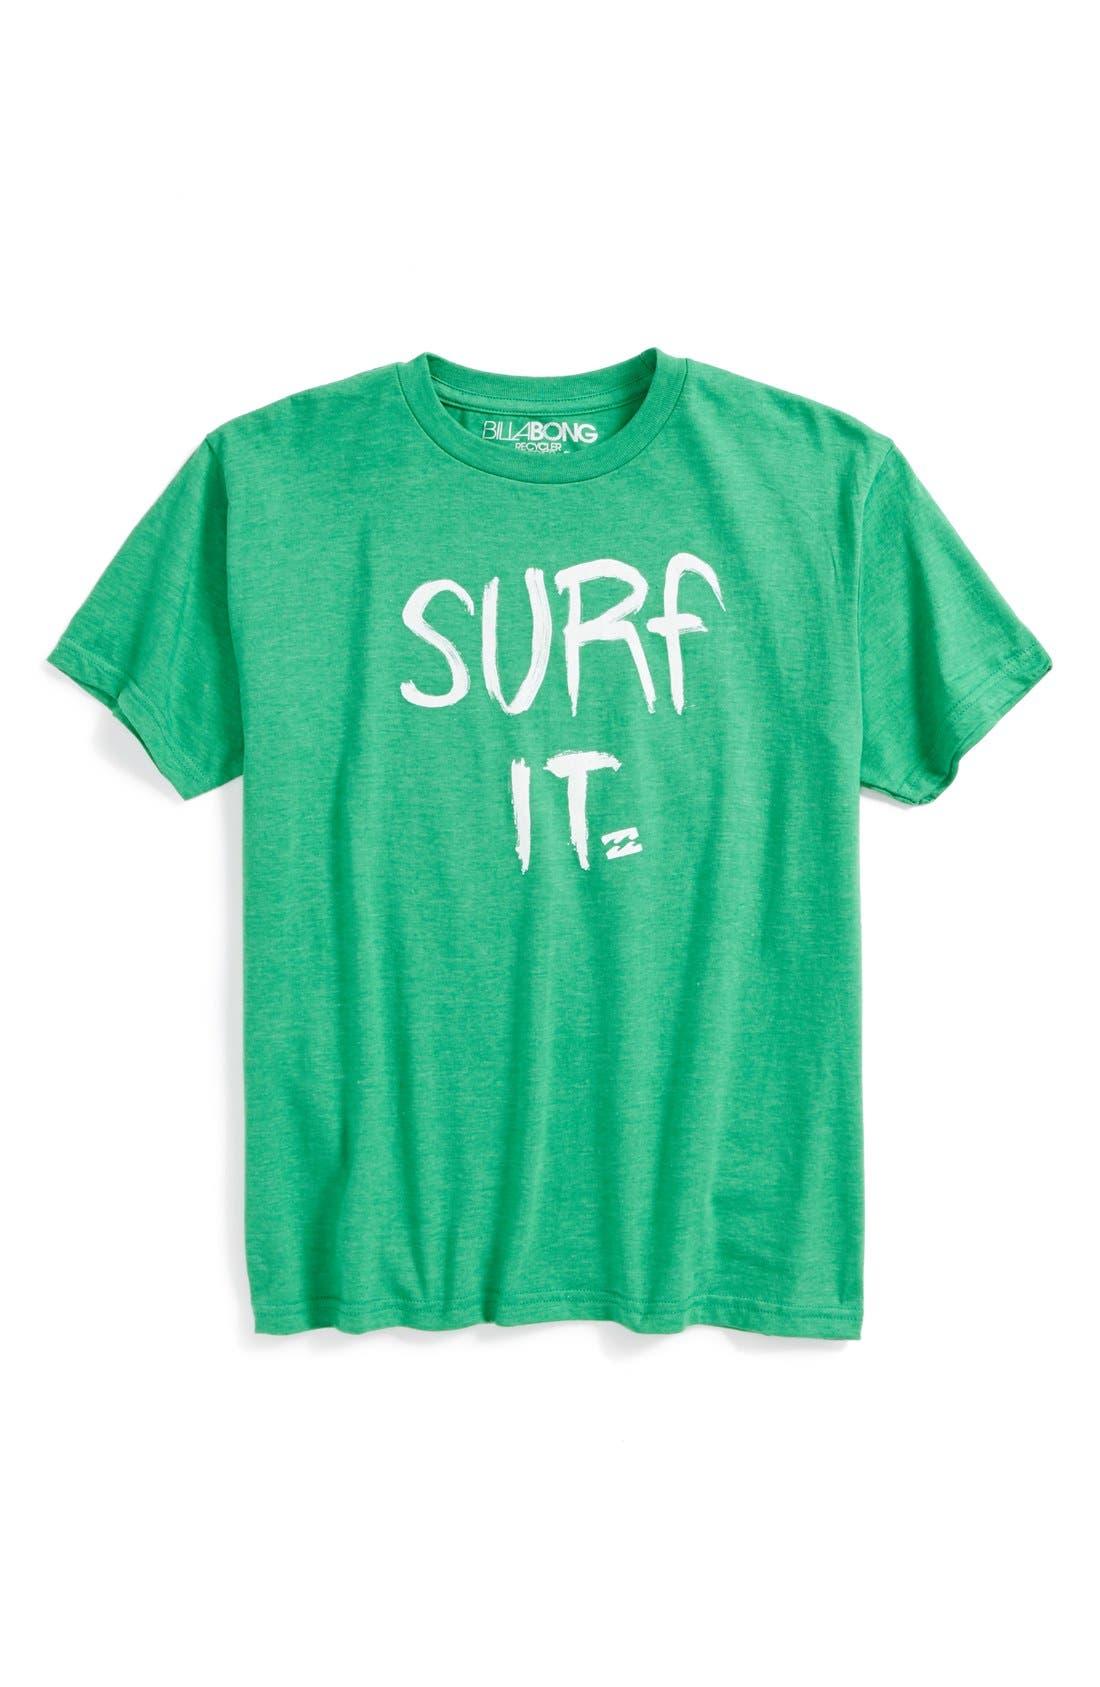 Alternate Image 1 Selected - Billabong 'Surf It' T-Shirt (Big Boys)